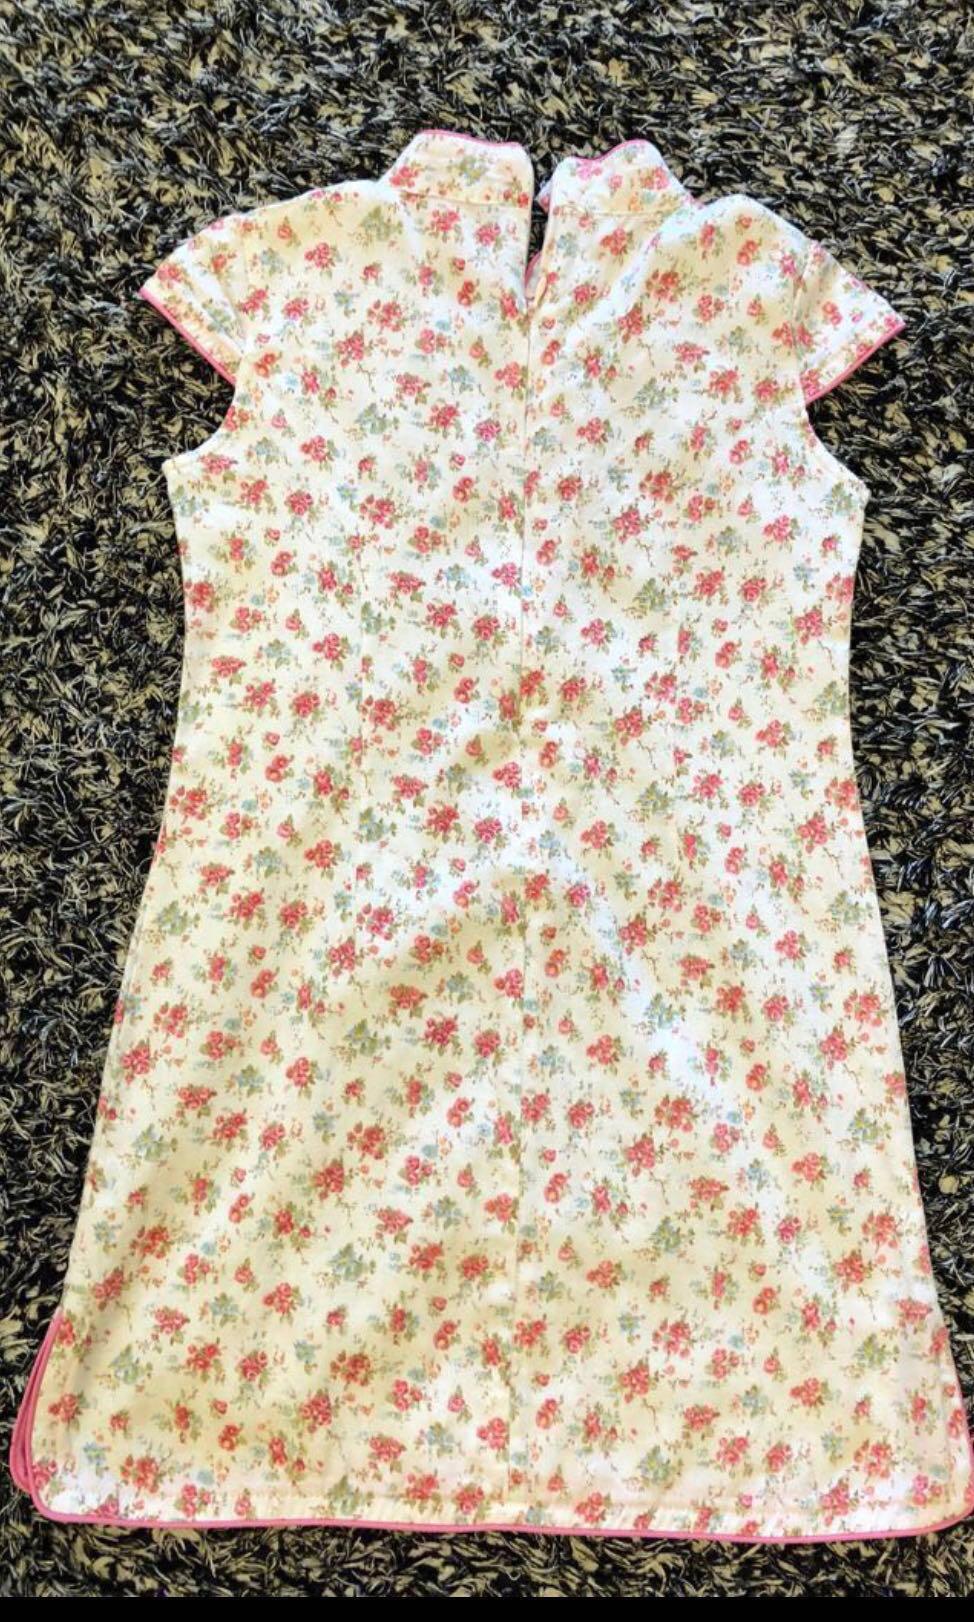 CNY Cheongsam Pink Flora dress